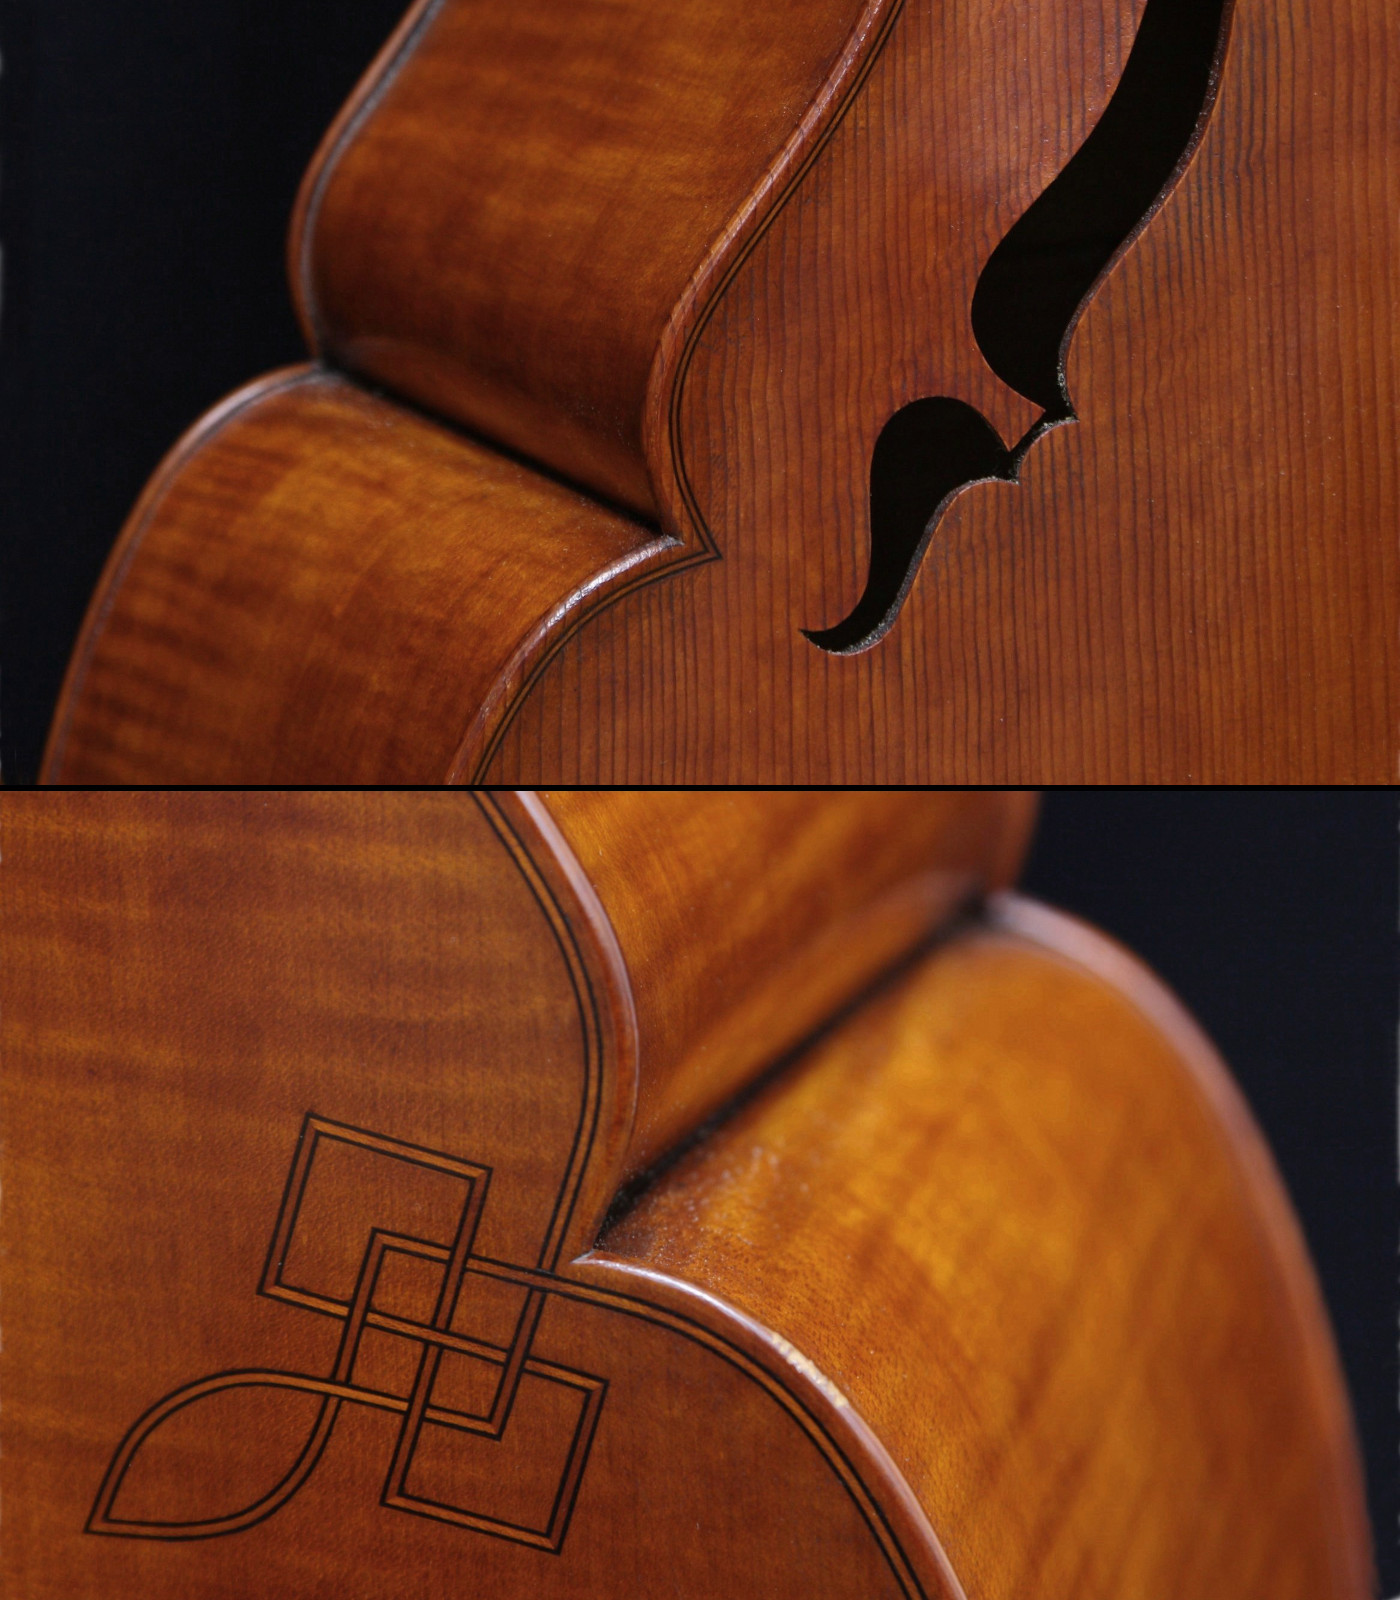 Violone en sol modelo M. Regenspurger